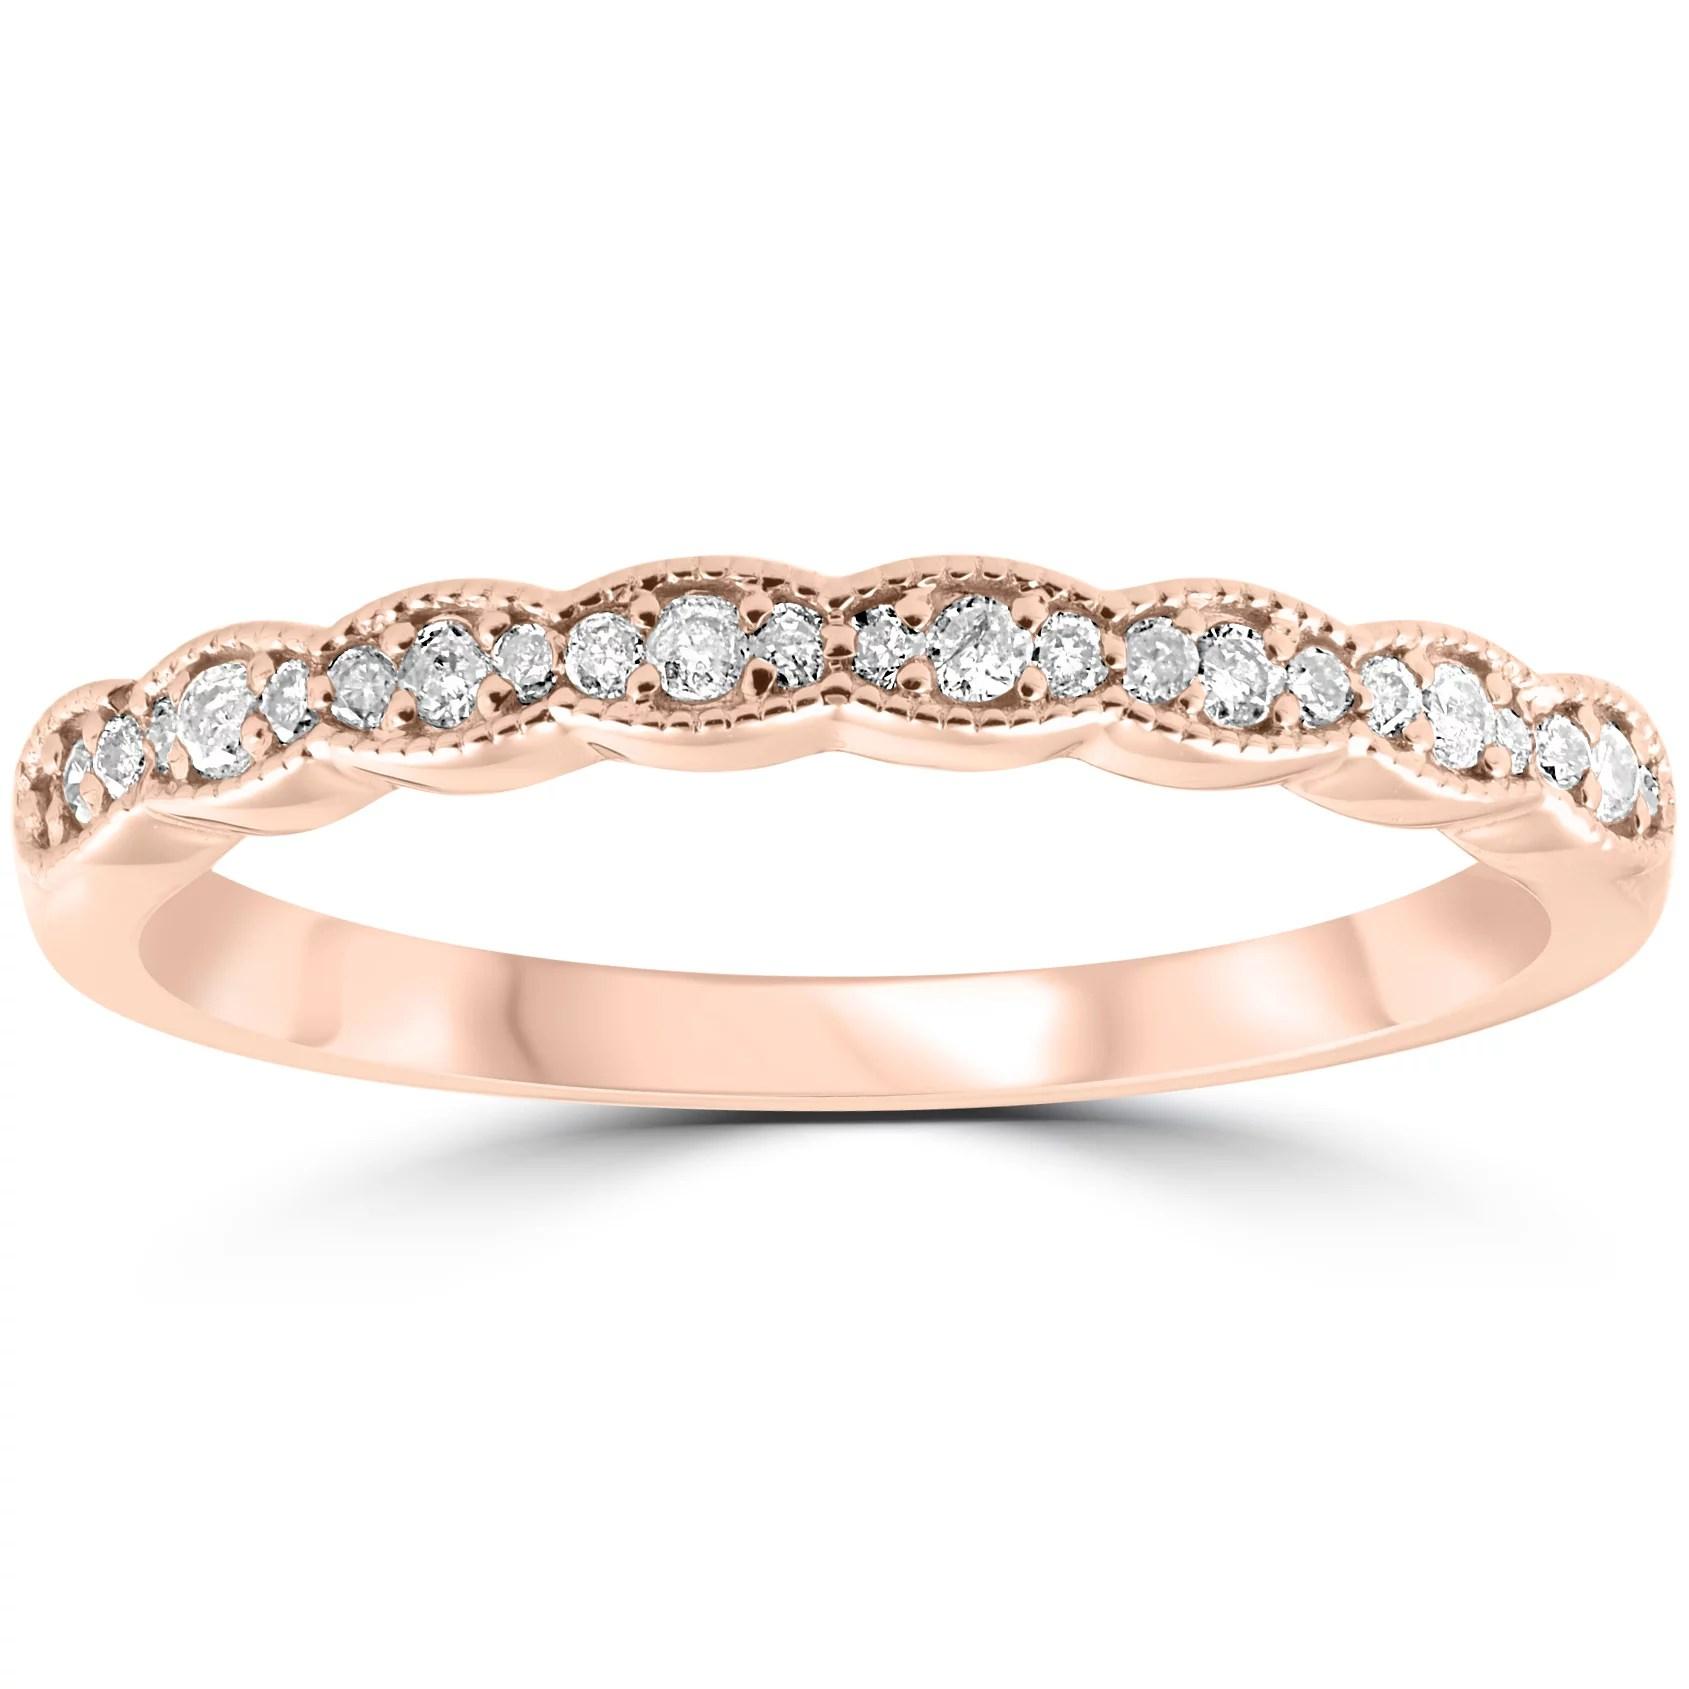 15 Cttw Diamond Stackable Womens Wedding Ring 14k Rose